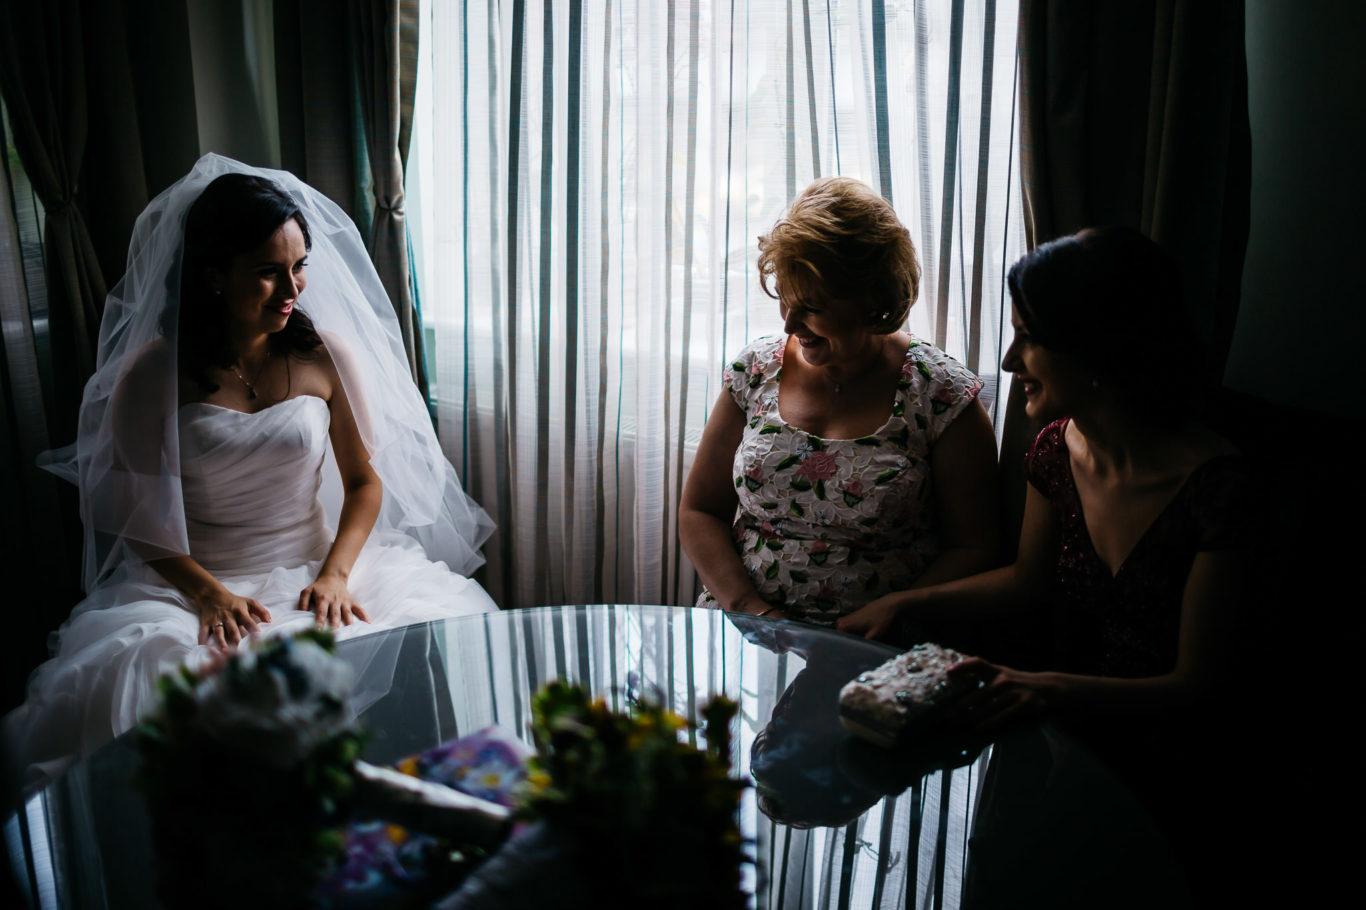 0350-Fotografie-nunta-Simona-Valentin-fotograf-Ciprian-Dumitrescu-CDF_8936